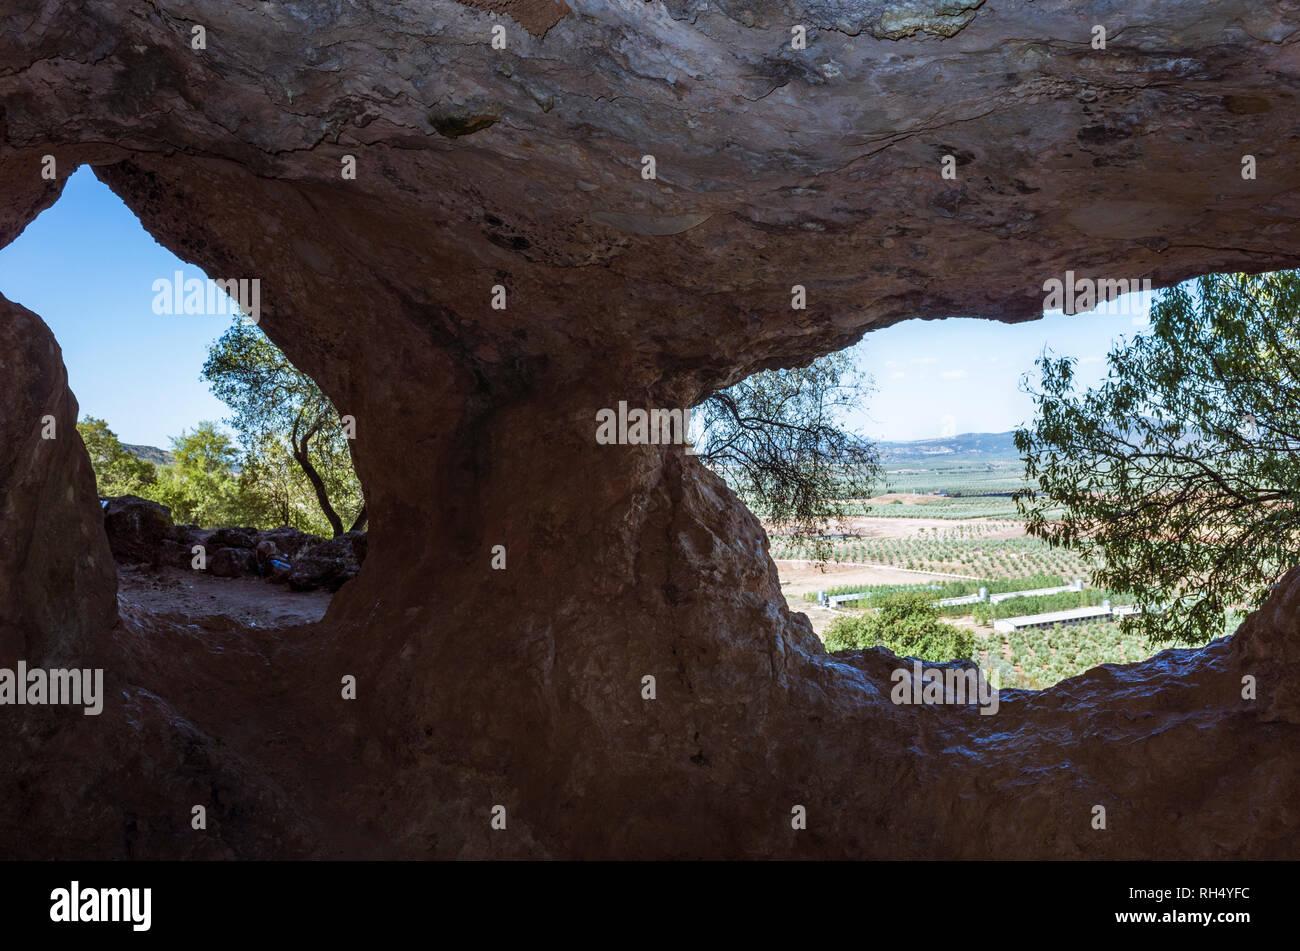 Castellar, Jaen province, Andalusia, Spain : IV century BC Iberian cave santuary known as Cueva de la Lobera where numerous Iberian votive offerings h Stock Photo